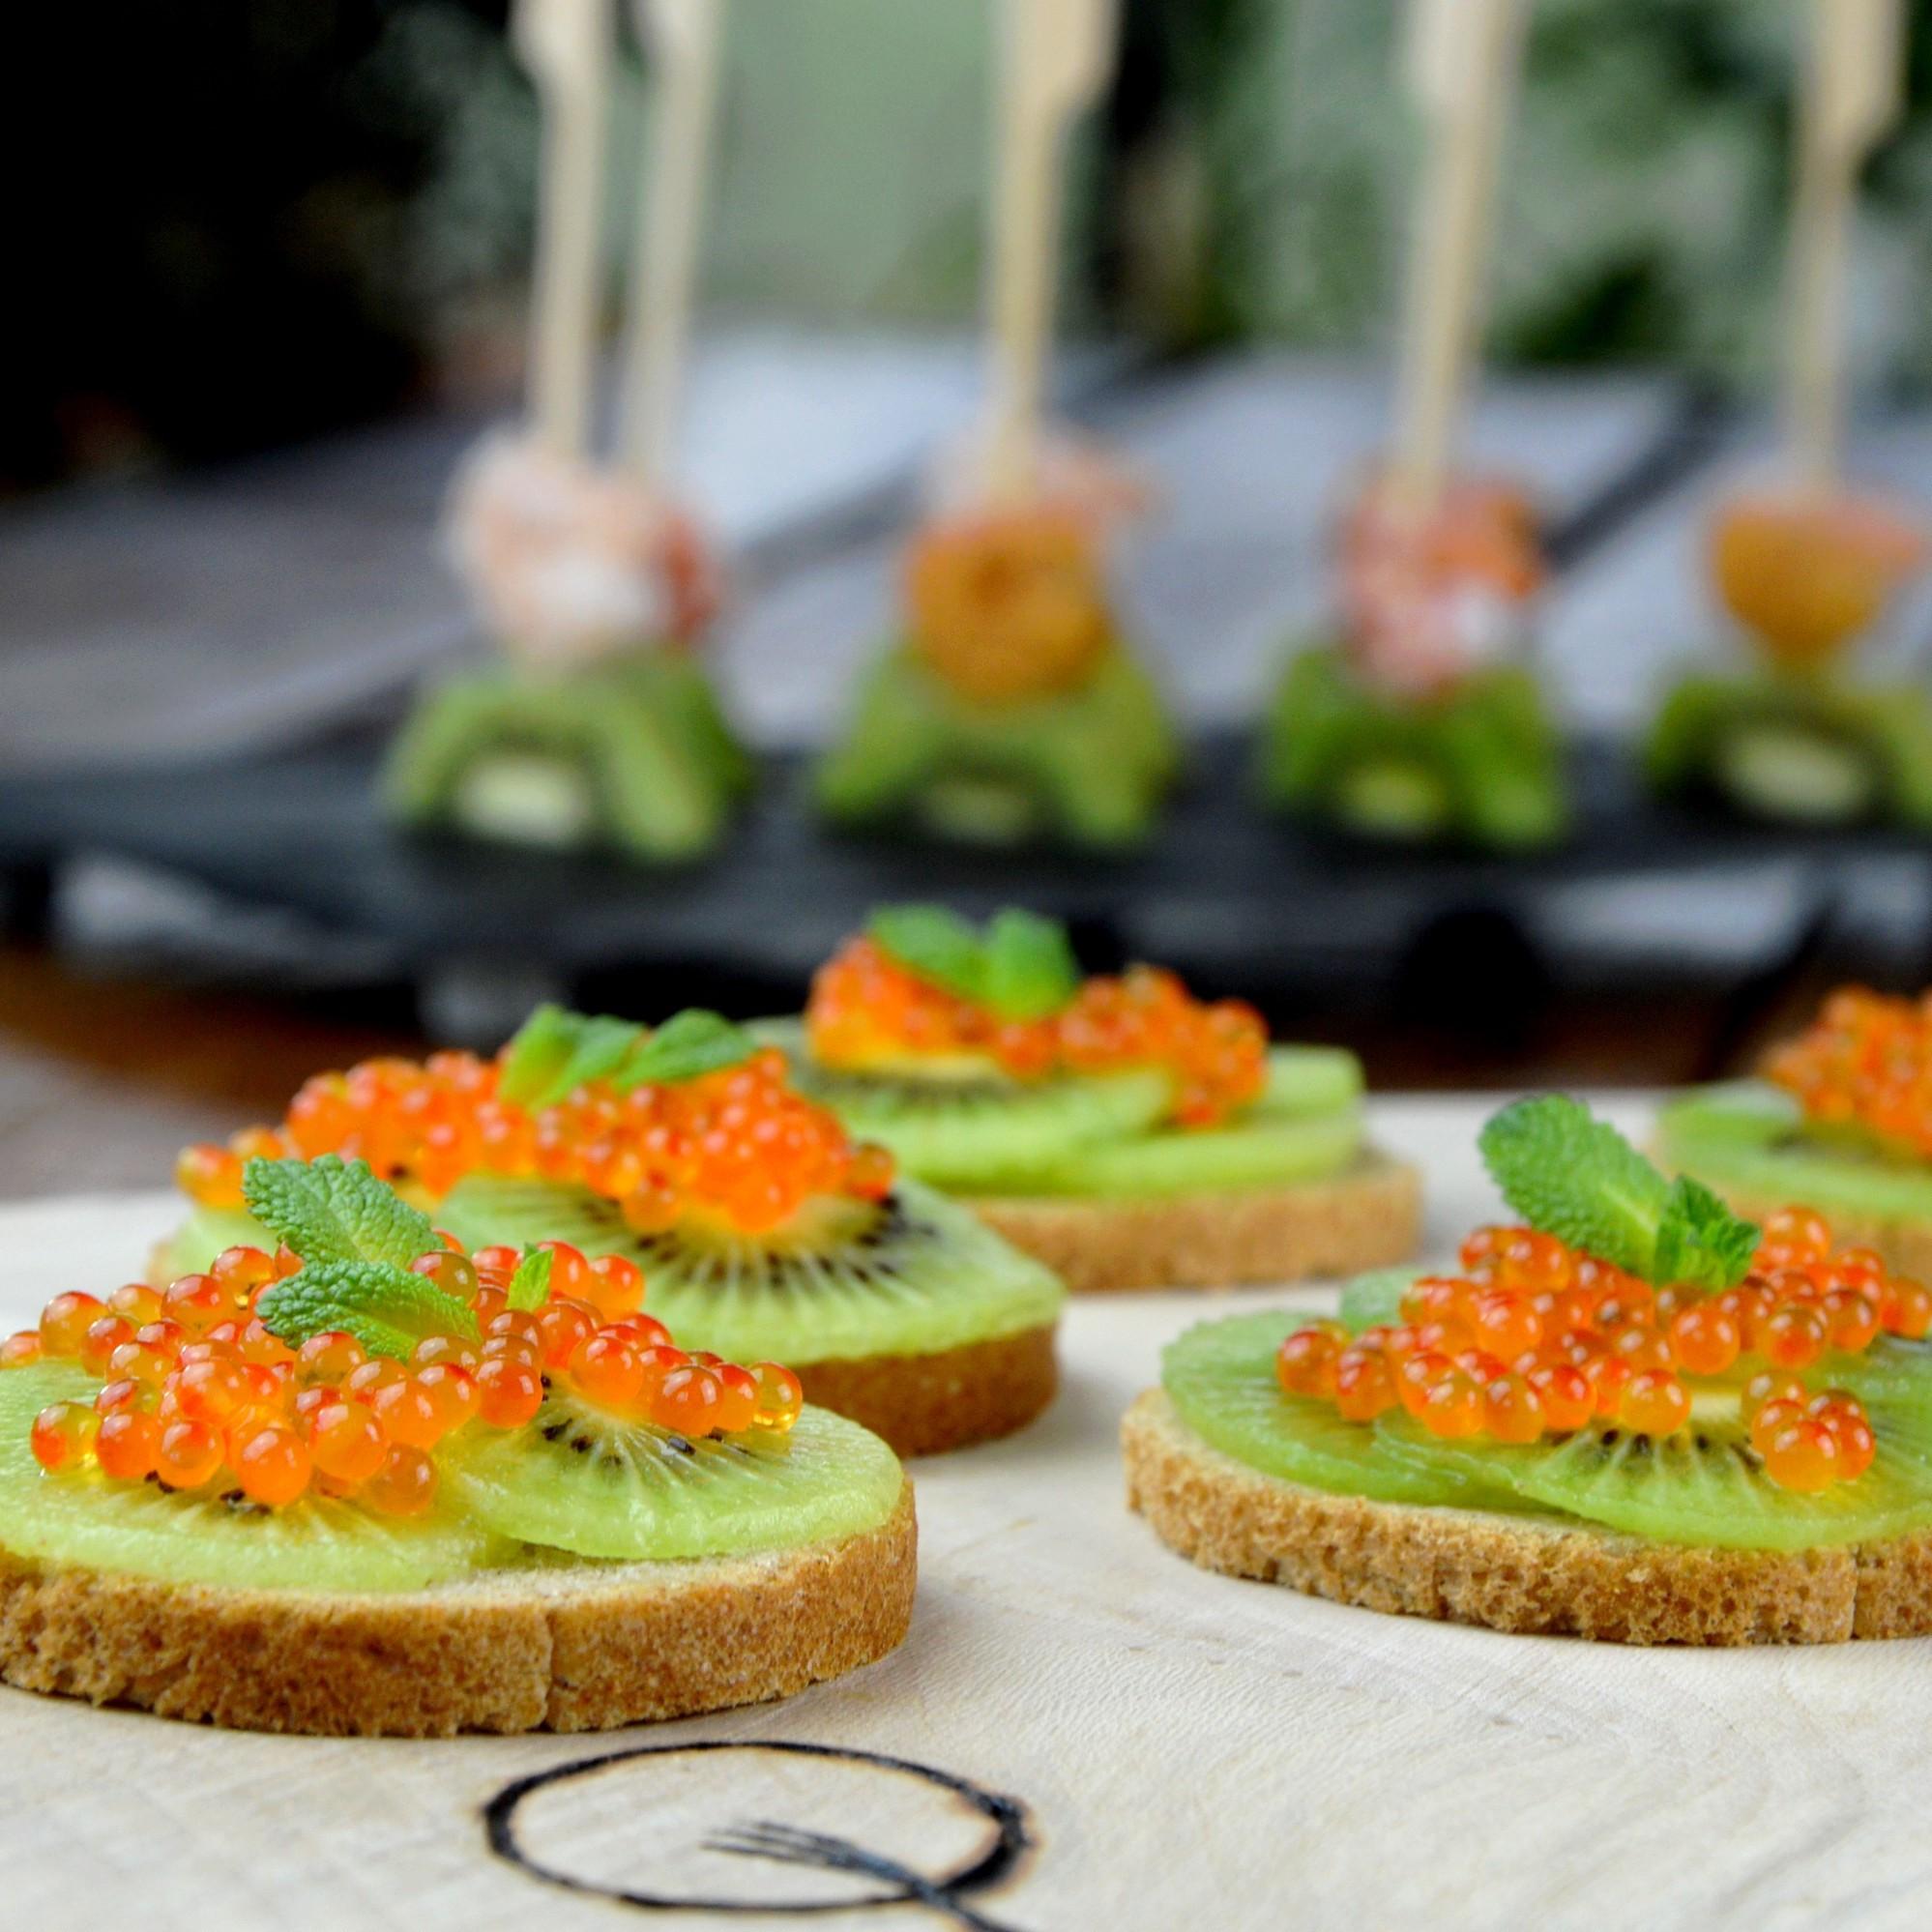 Kiwi fruits toast and trout eggs